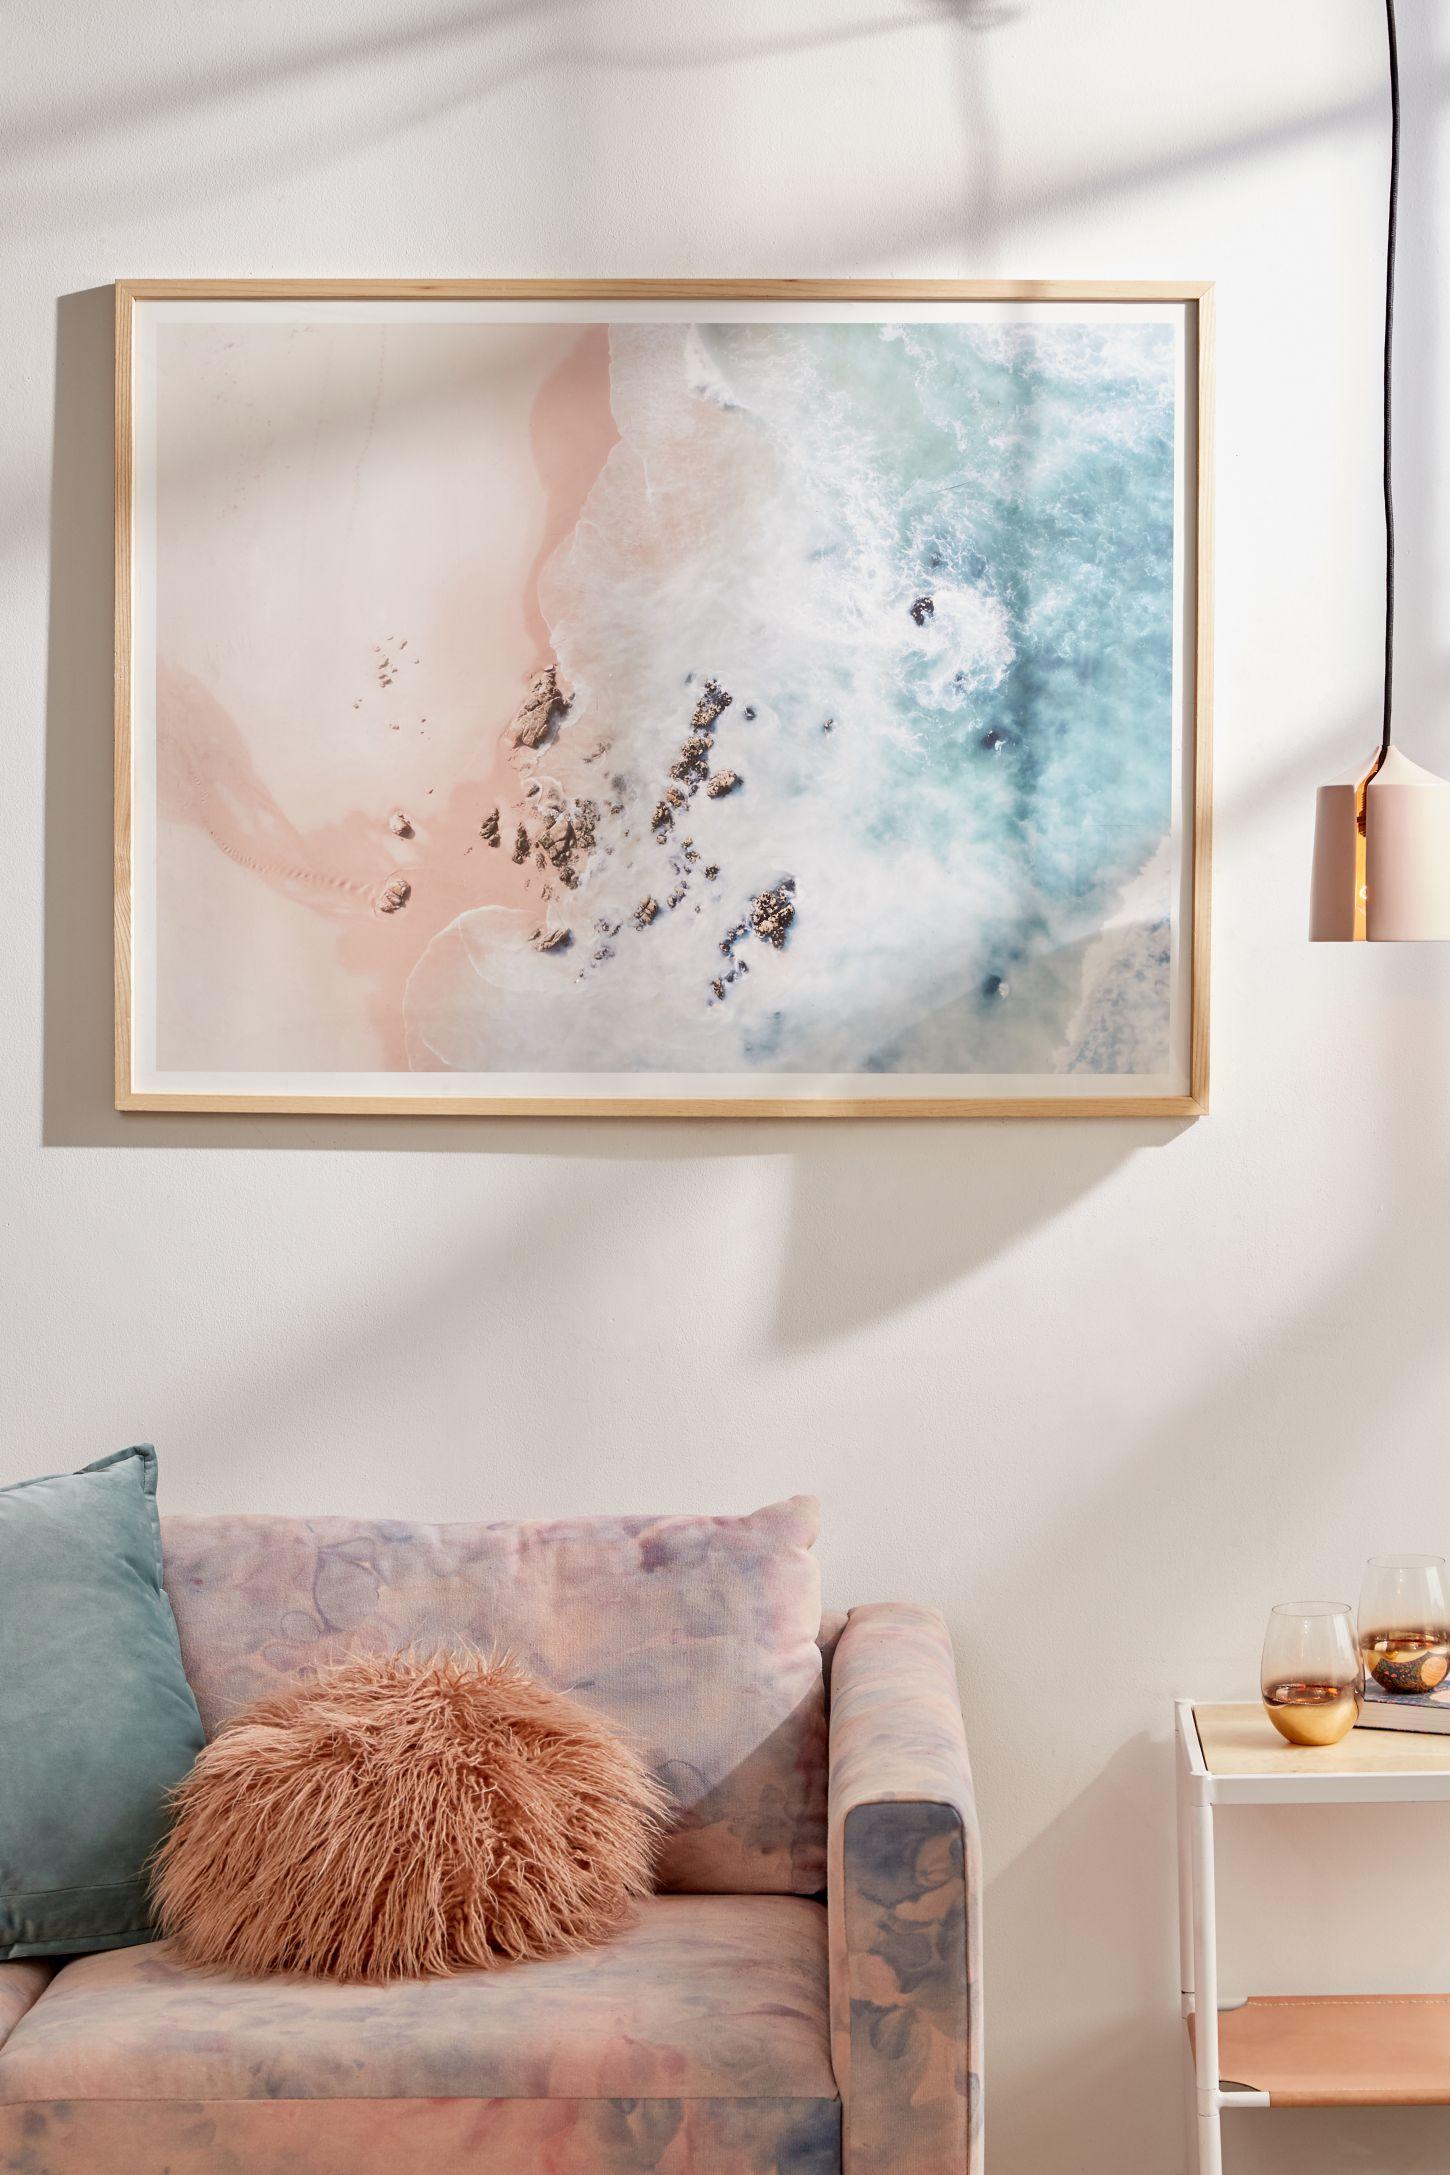 Assorted Apartment Art Room Décor